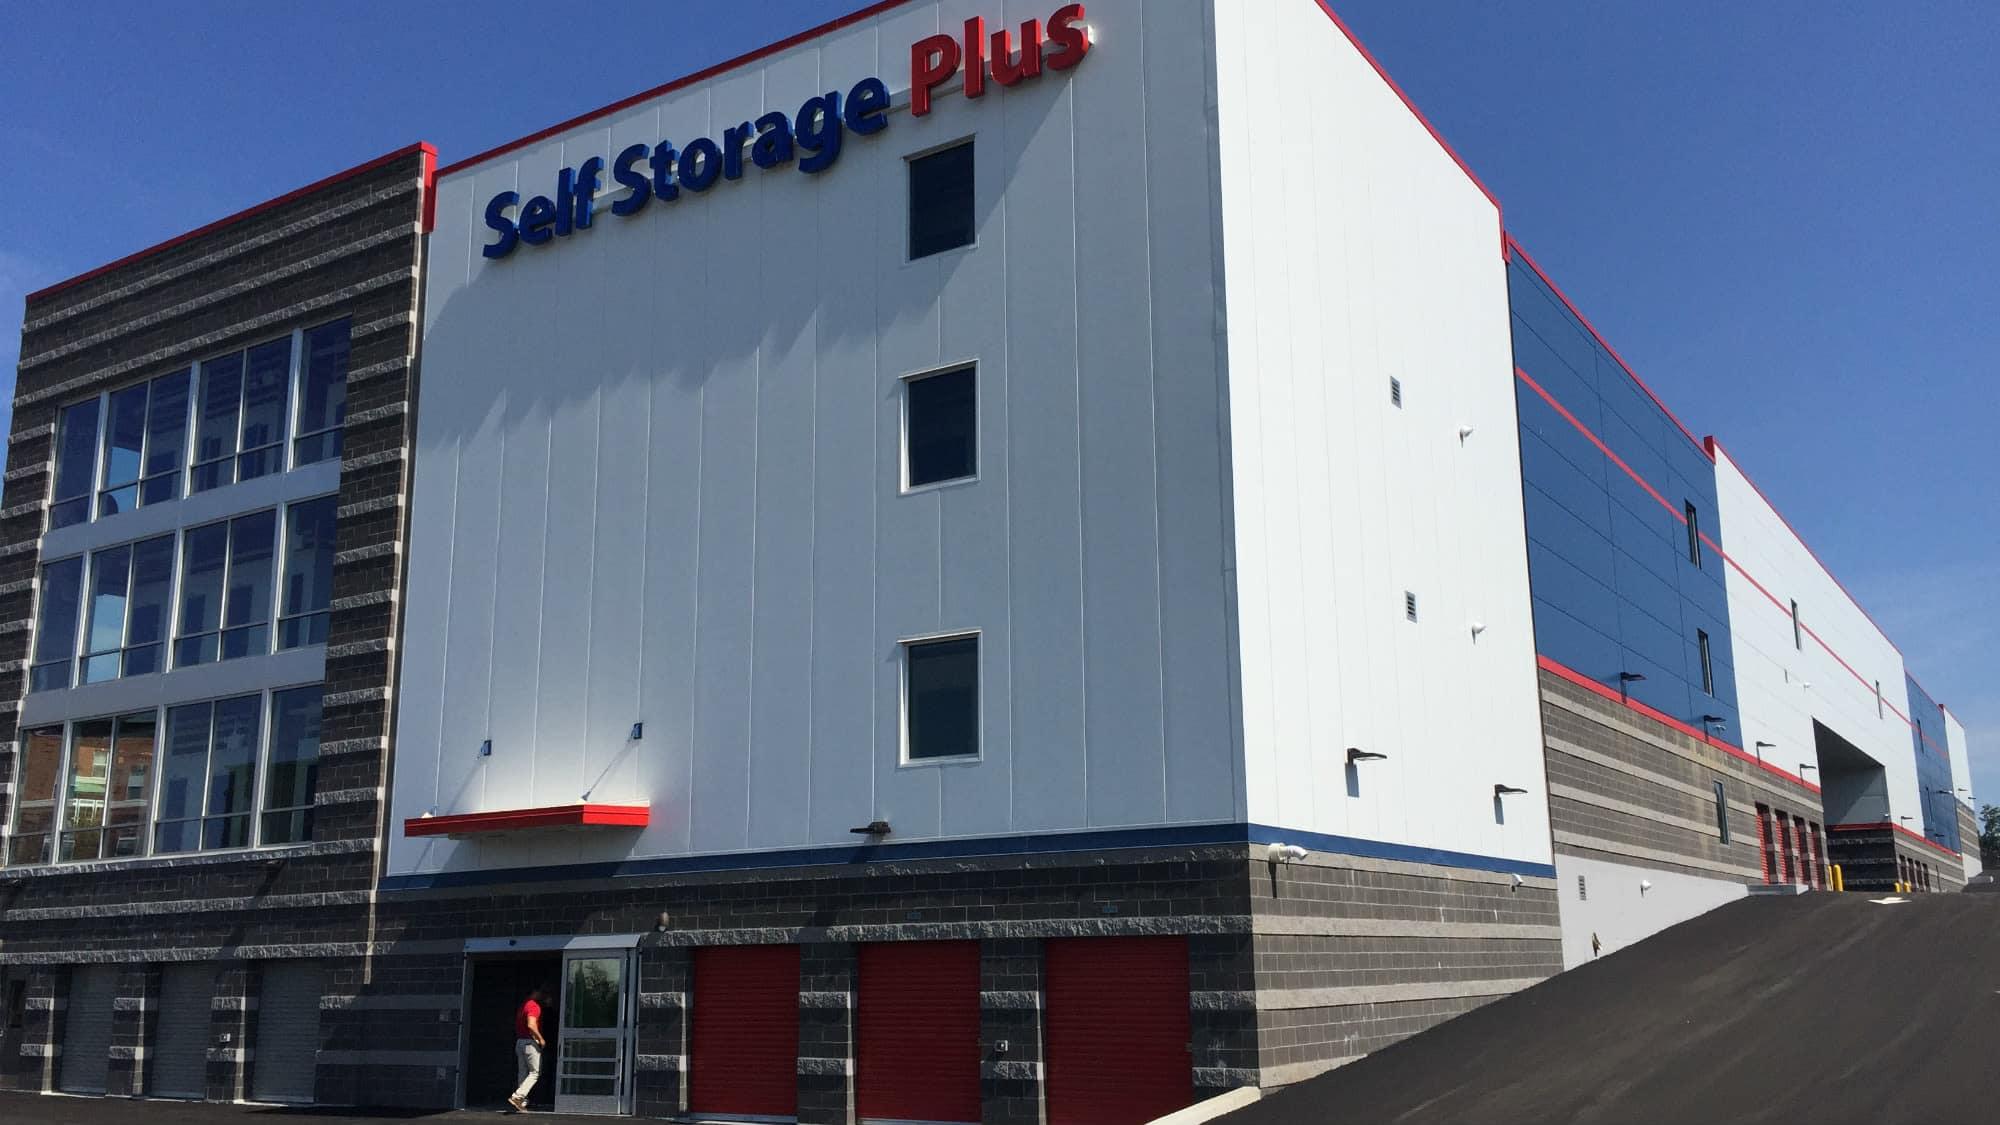 Self Storage Plus exterior